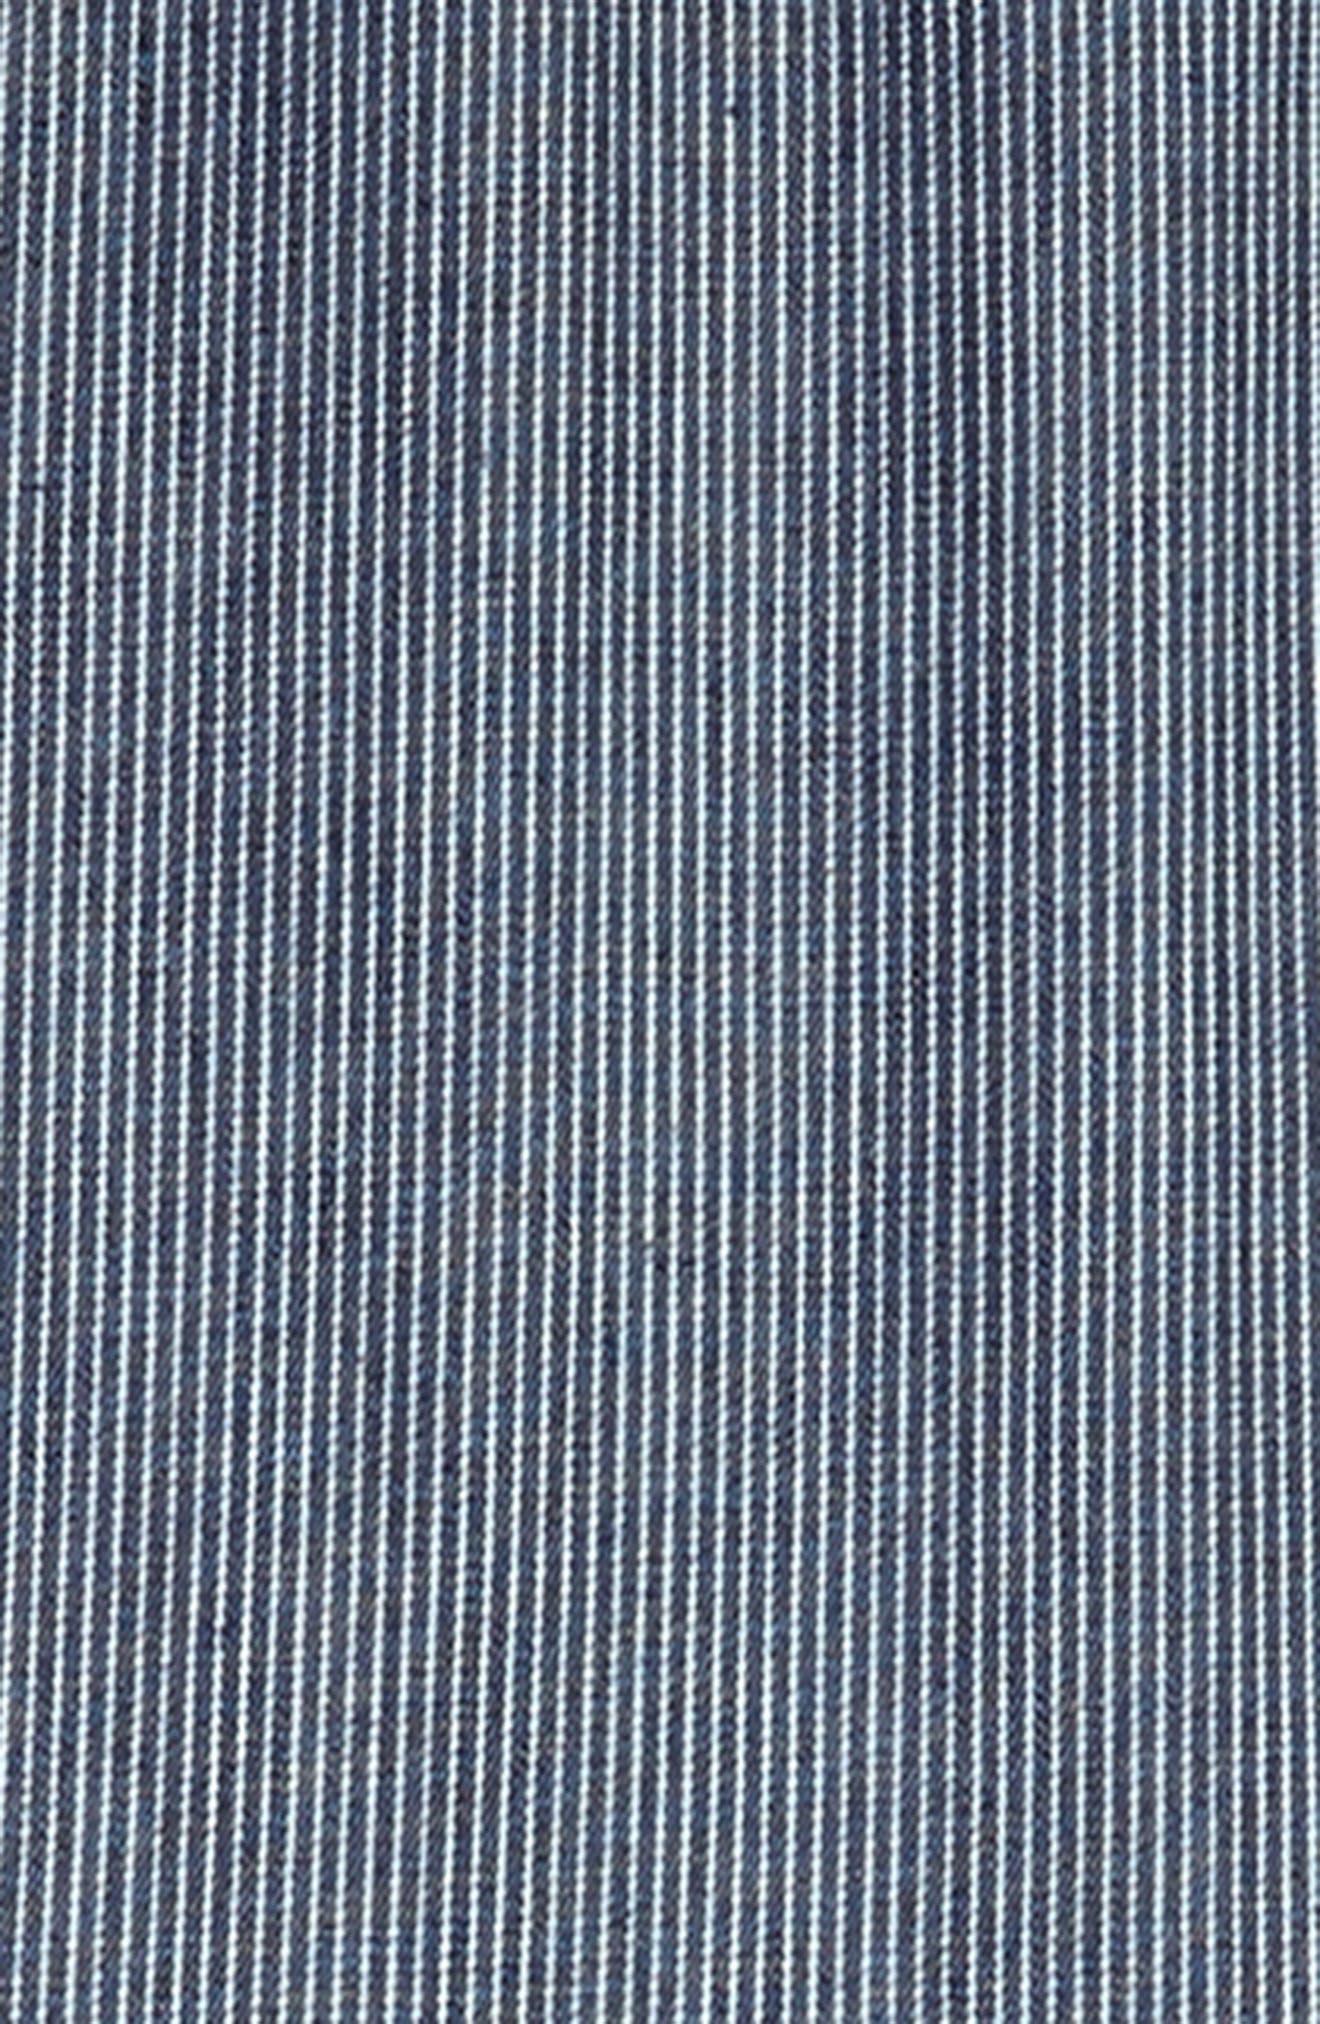 Ruffle Shoulder Dress,                             Alternate thumbnail 3, color,                             410